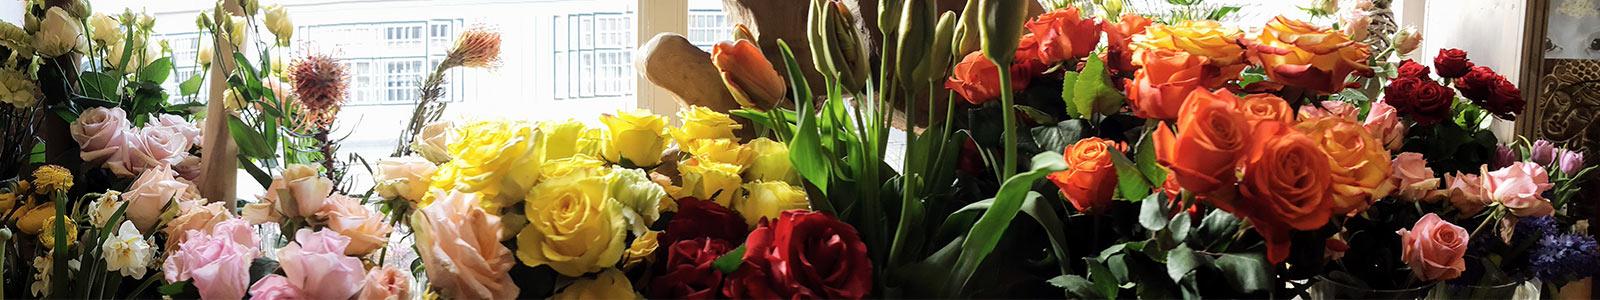 Blumenhaus Sass grosses Angebot an Blumen, Pflanzen und Accessoires